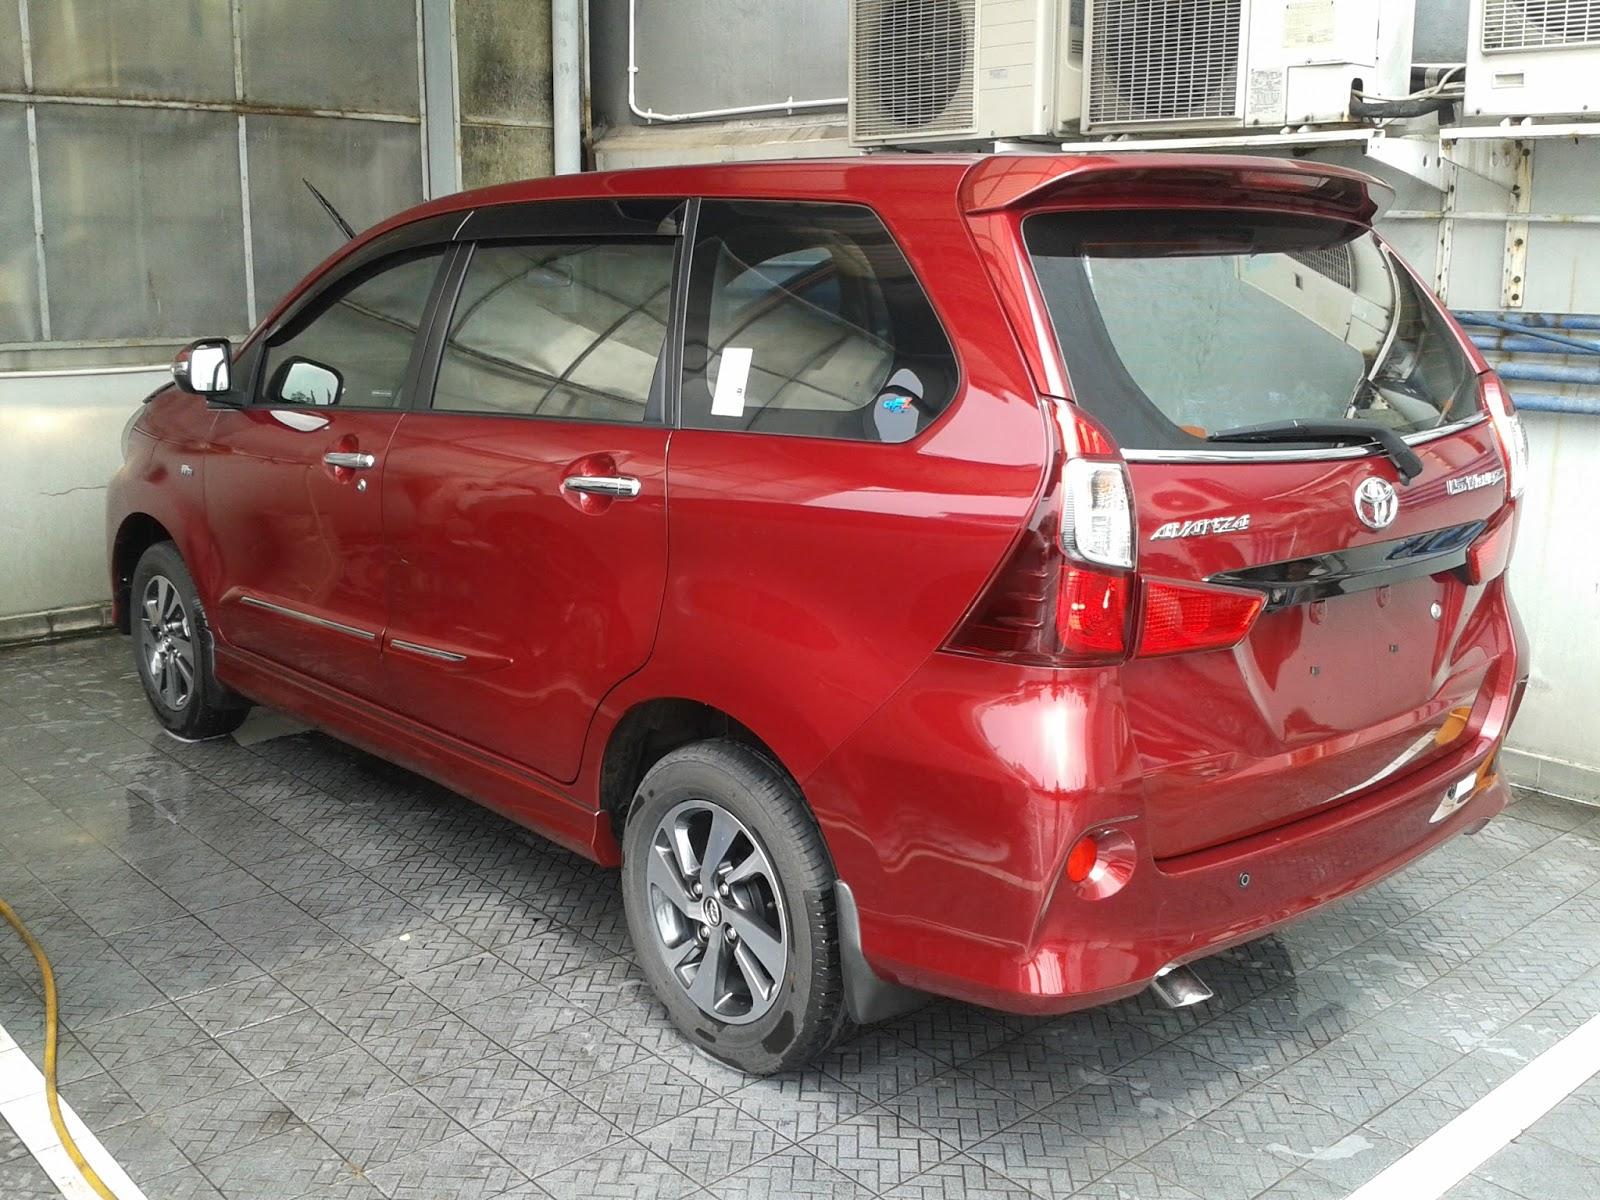 Grand New Veloz 1.5 Matic Brand Toyota Camry Nigeria Plaza Kyai Tapa Dvd Player Di 1 5